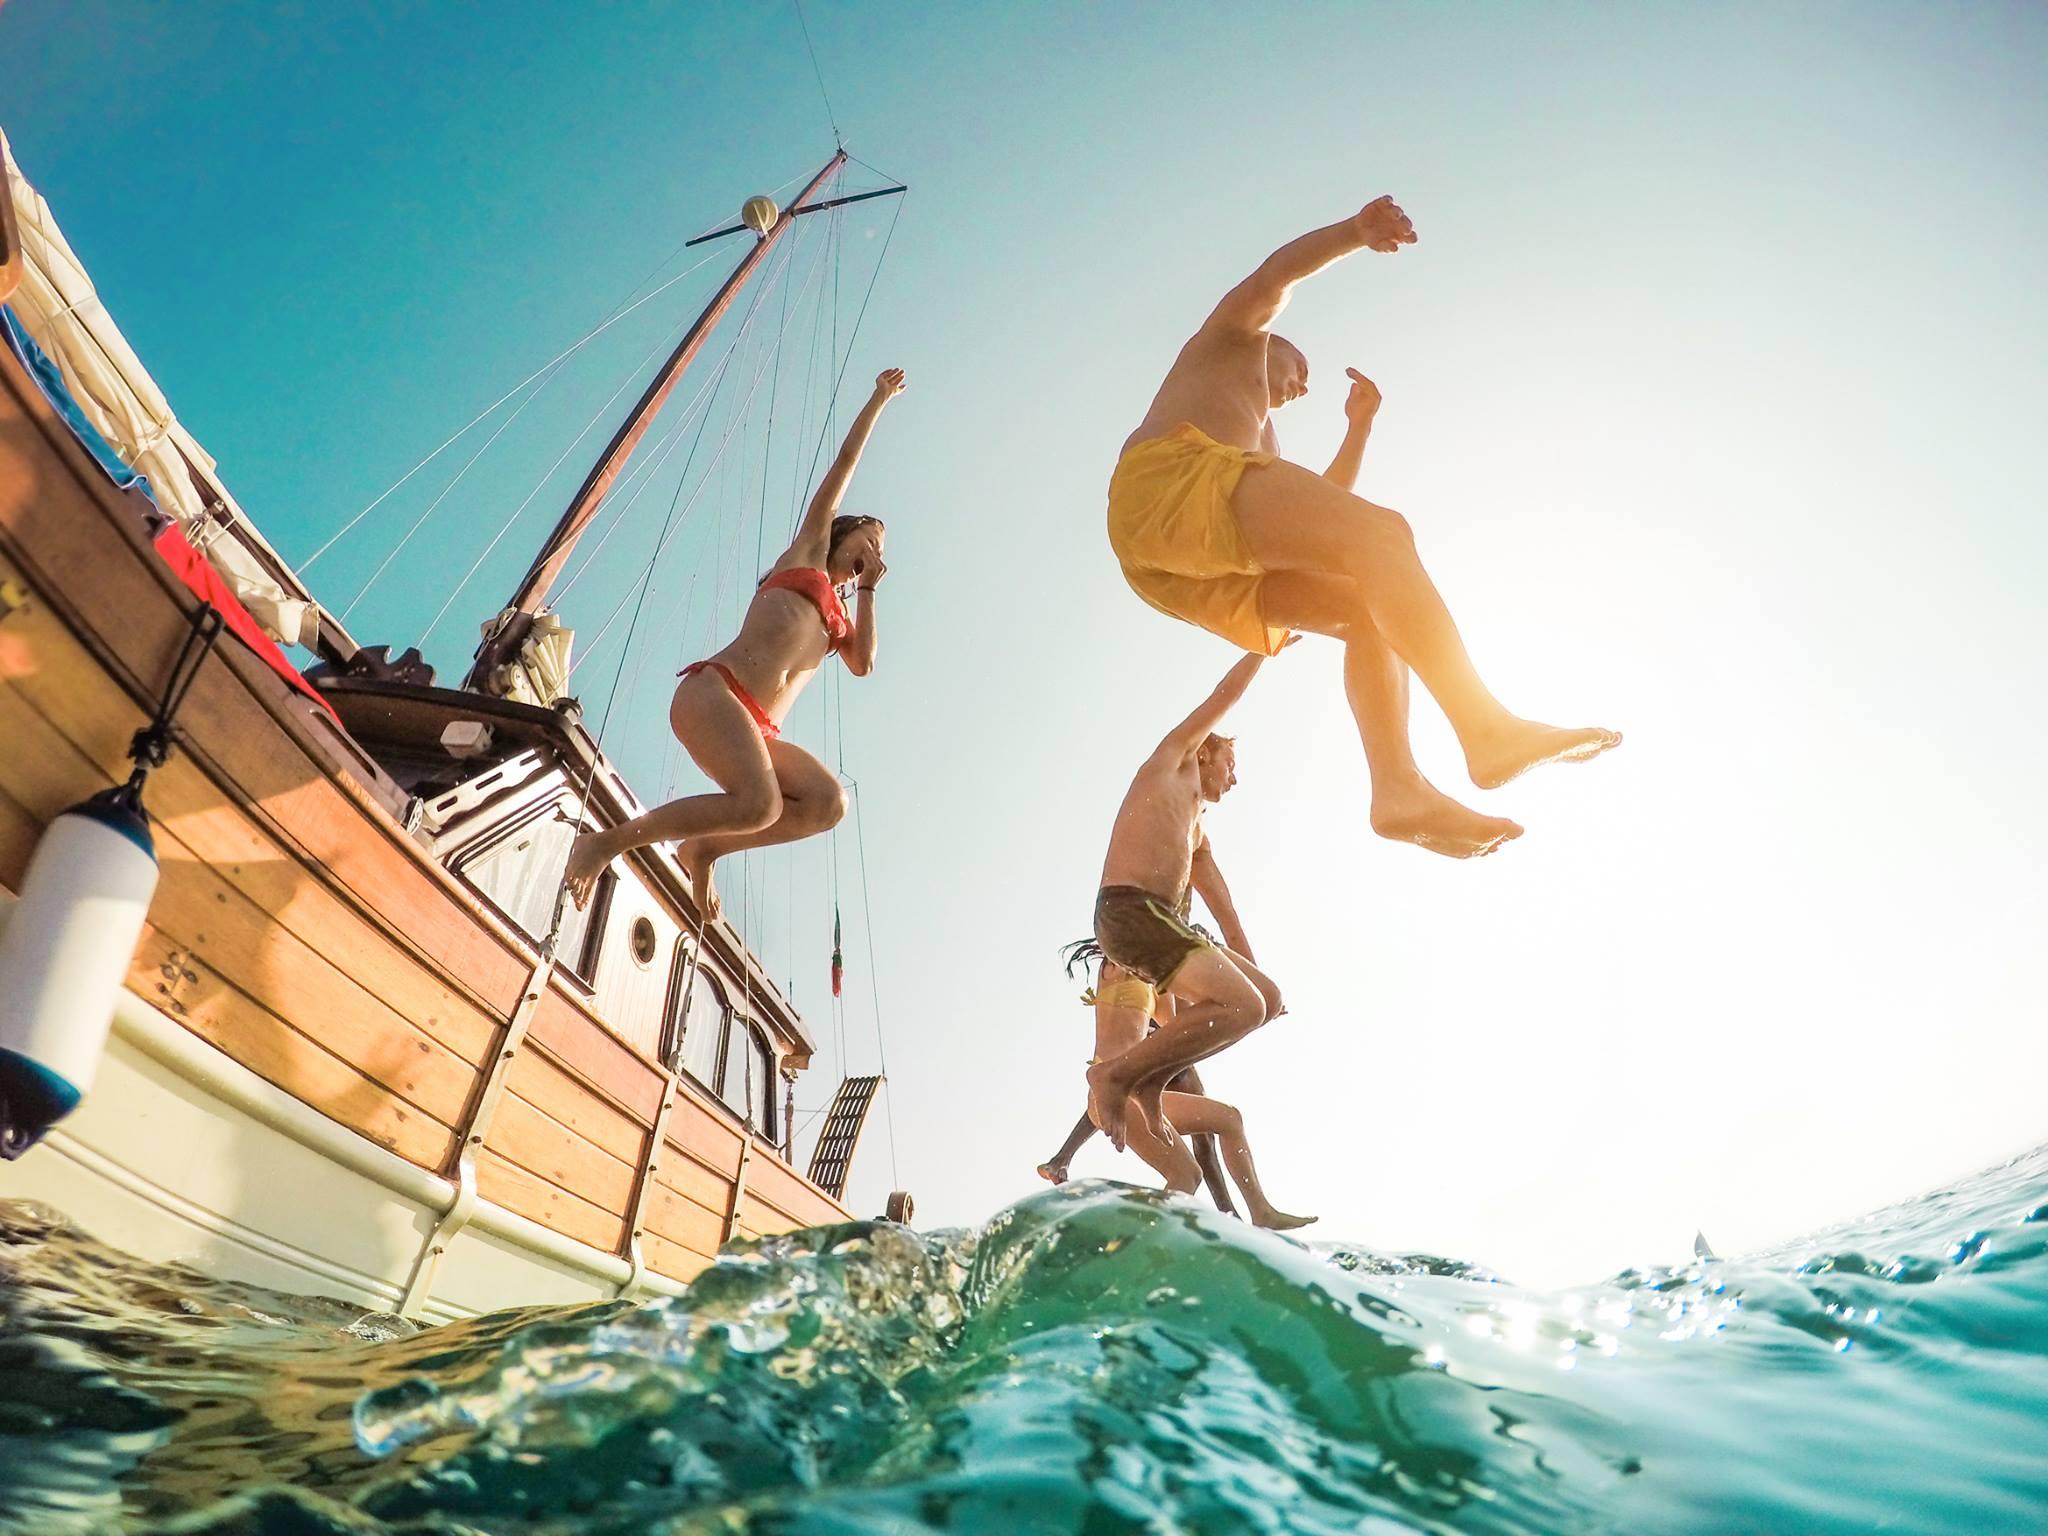 vakantiegroepskorting lloret de mar korting